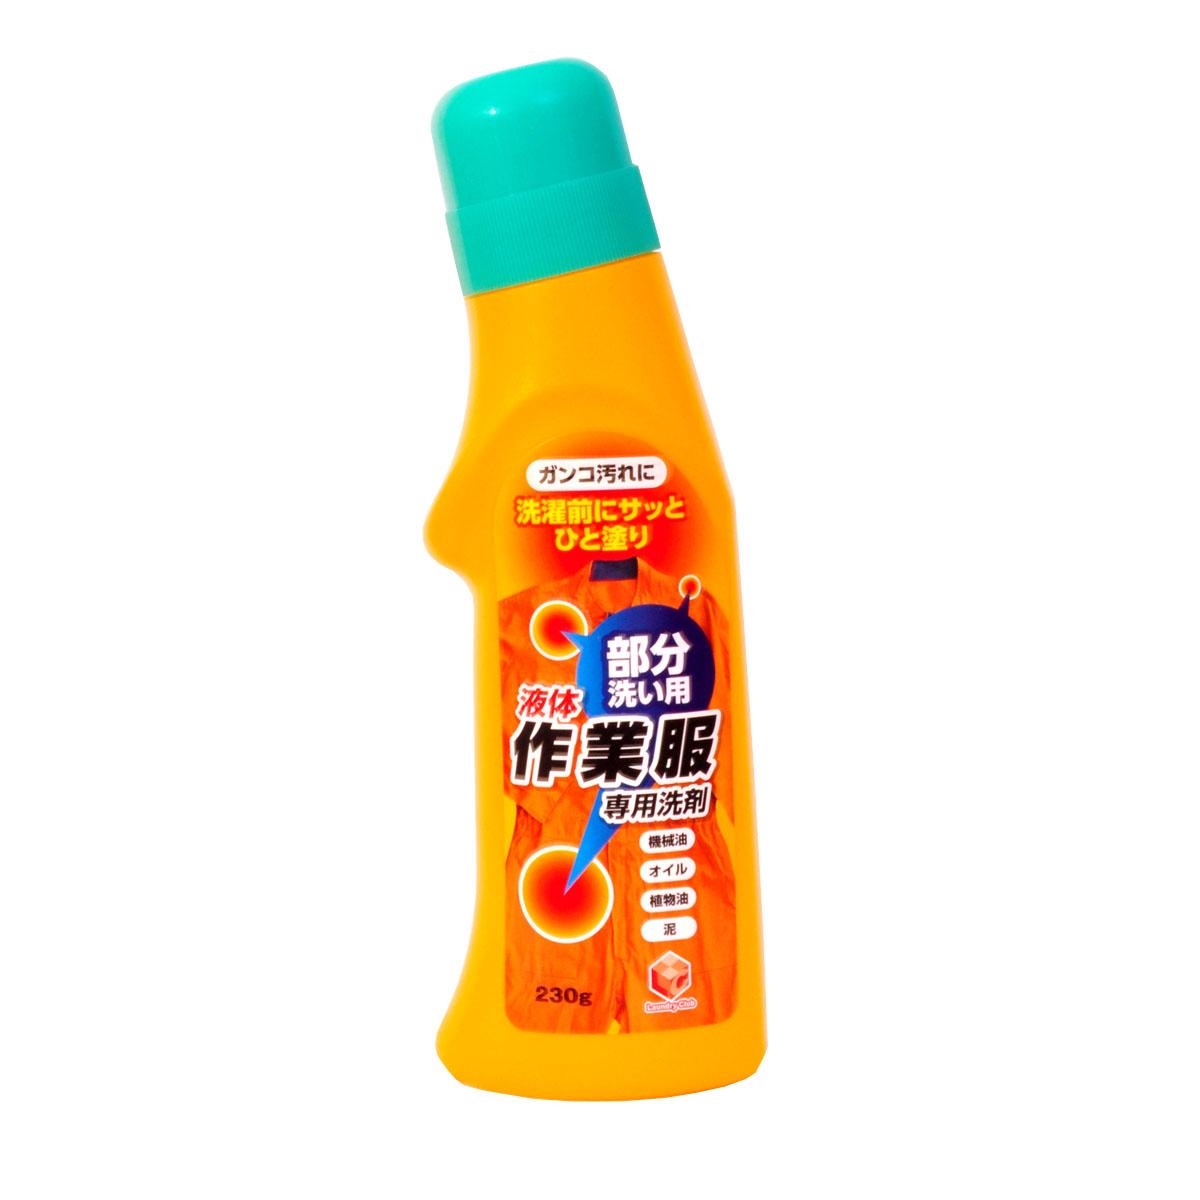 ������������ Daiichi ����� 230 �� ��� �������� � �����������